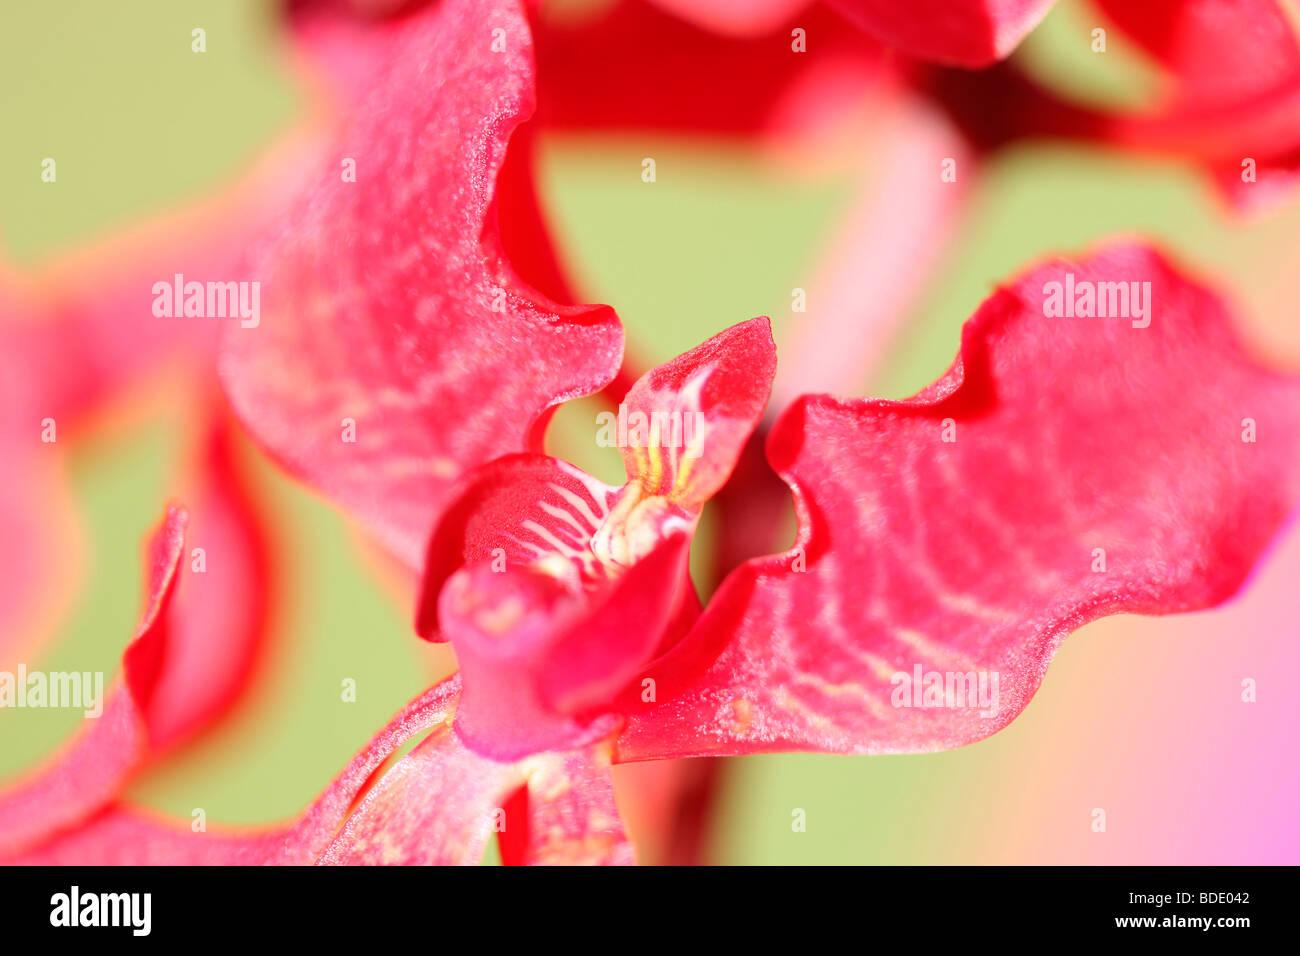 Increíble azima mokara orchid - fotografía artística Jane-Ann Butler Fotografía JABP568 Imagen De Stock